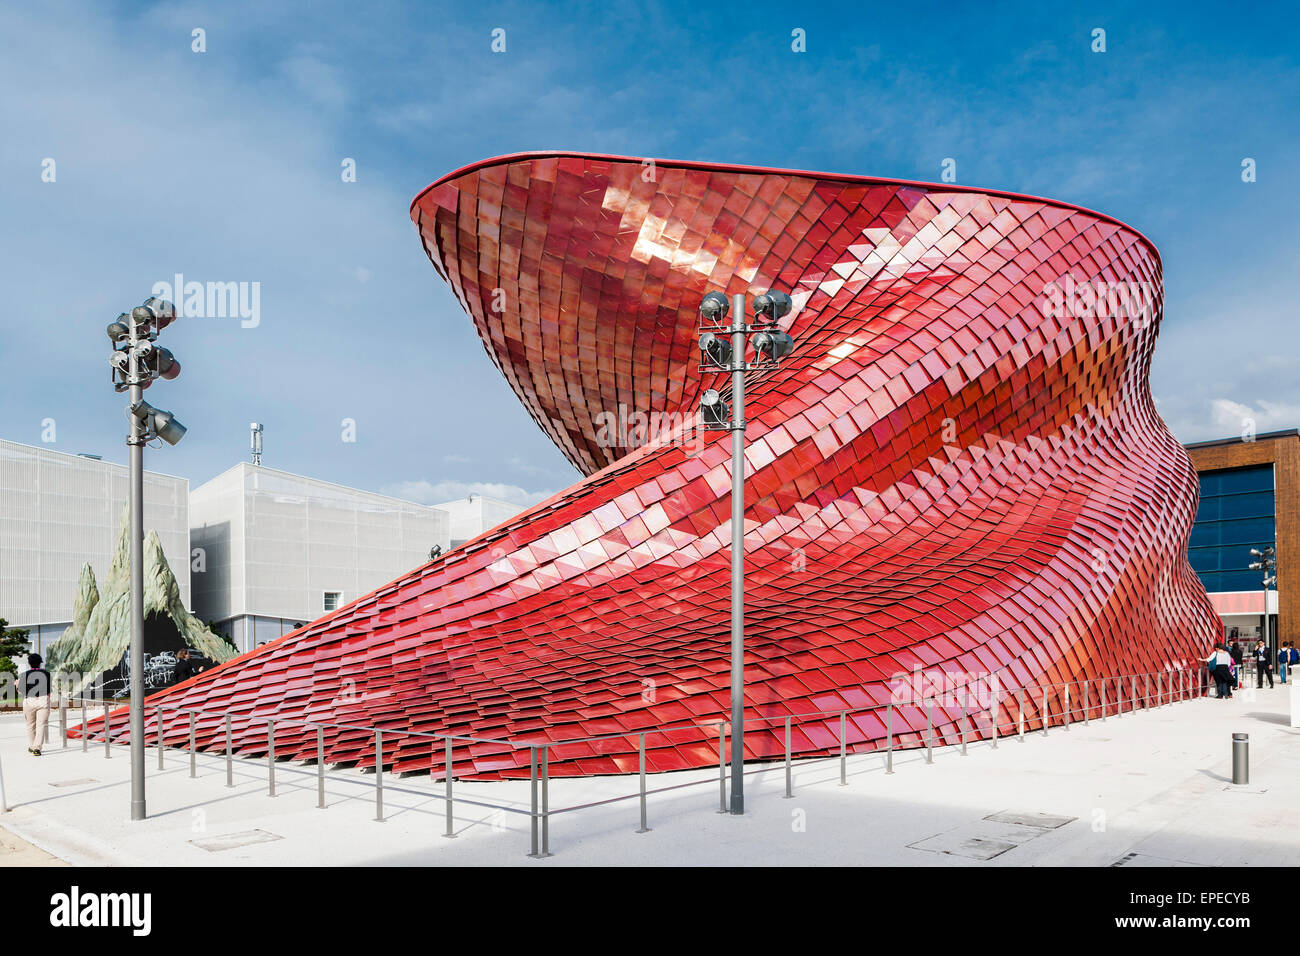 Sculptural, serpentine facade. Milan Expo 2015, Vanke Pavilion, Milan, Italy. Architect: Daniel Libeskind, 2015. - Stock Image